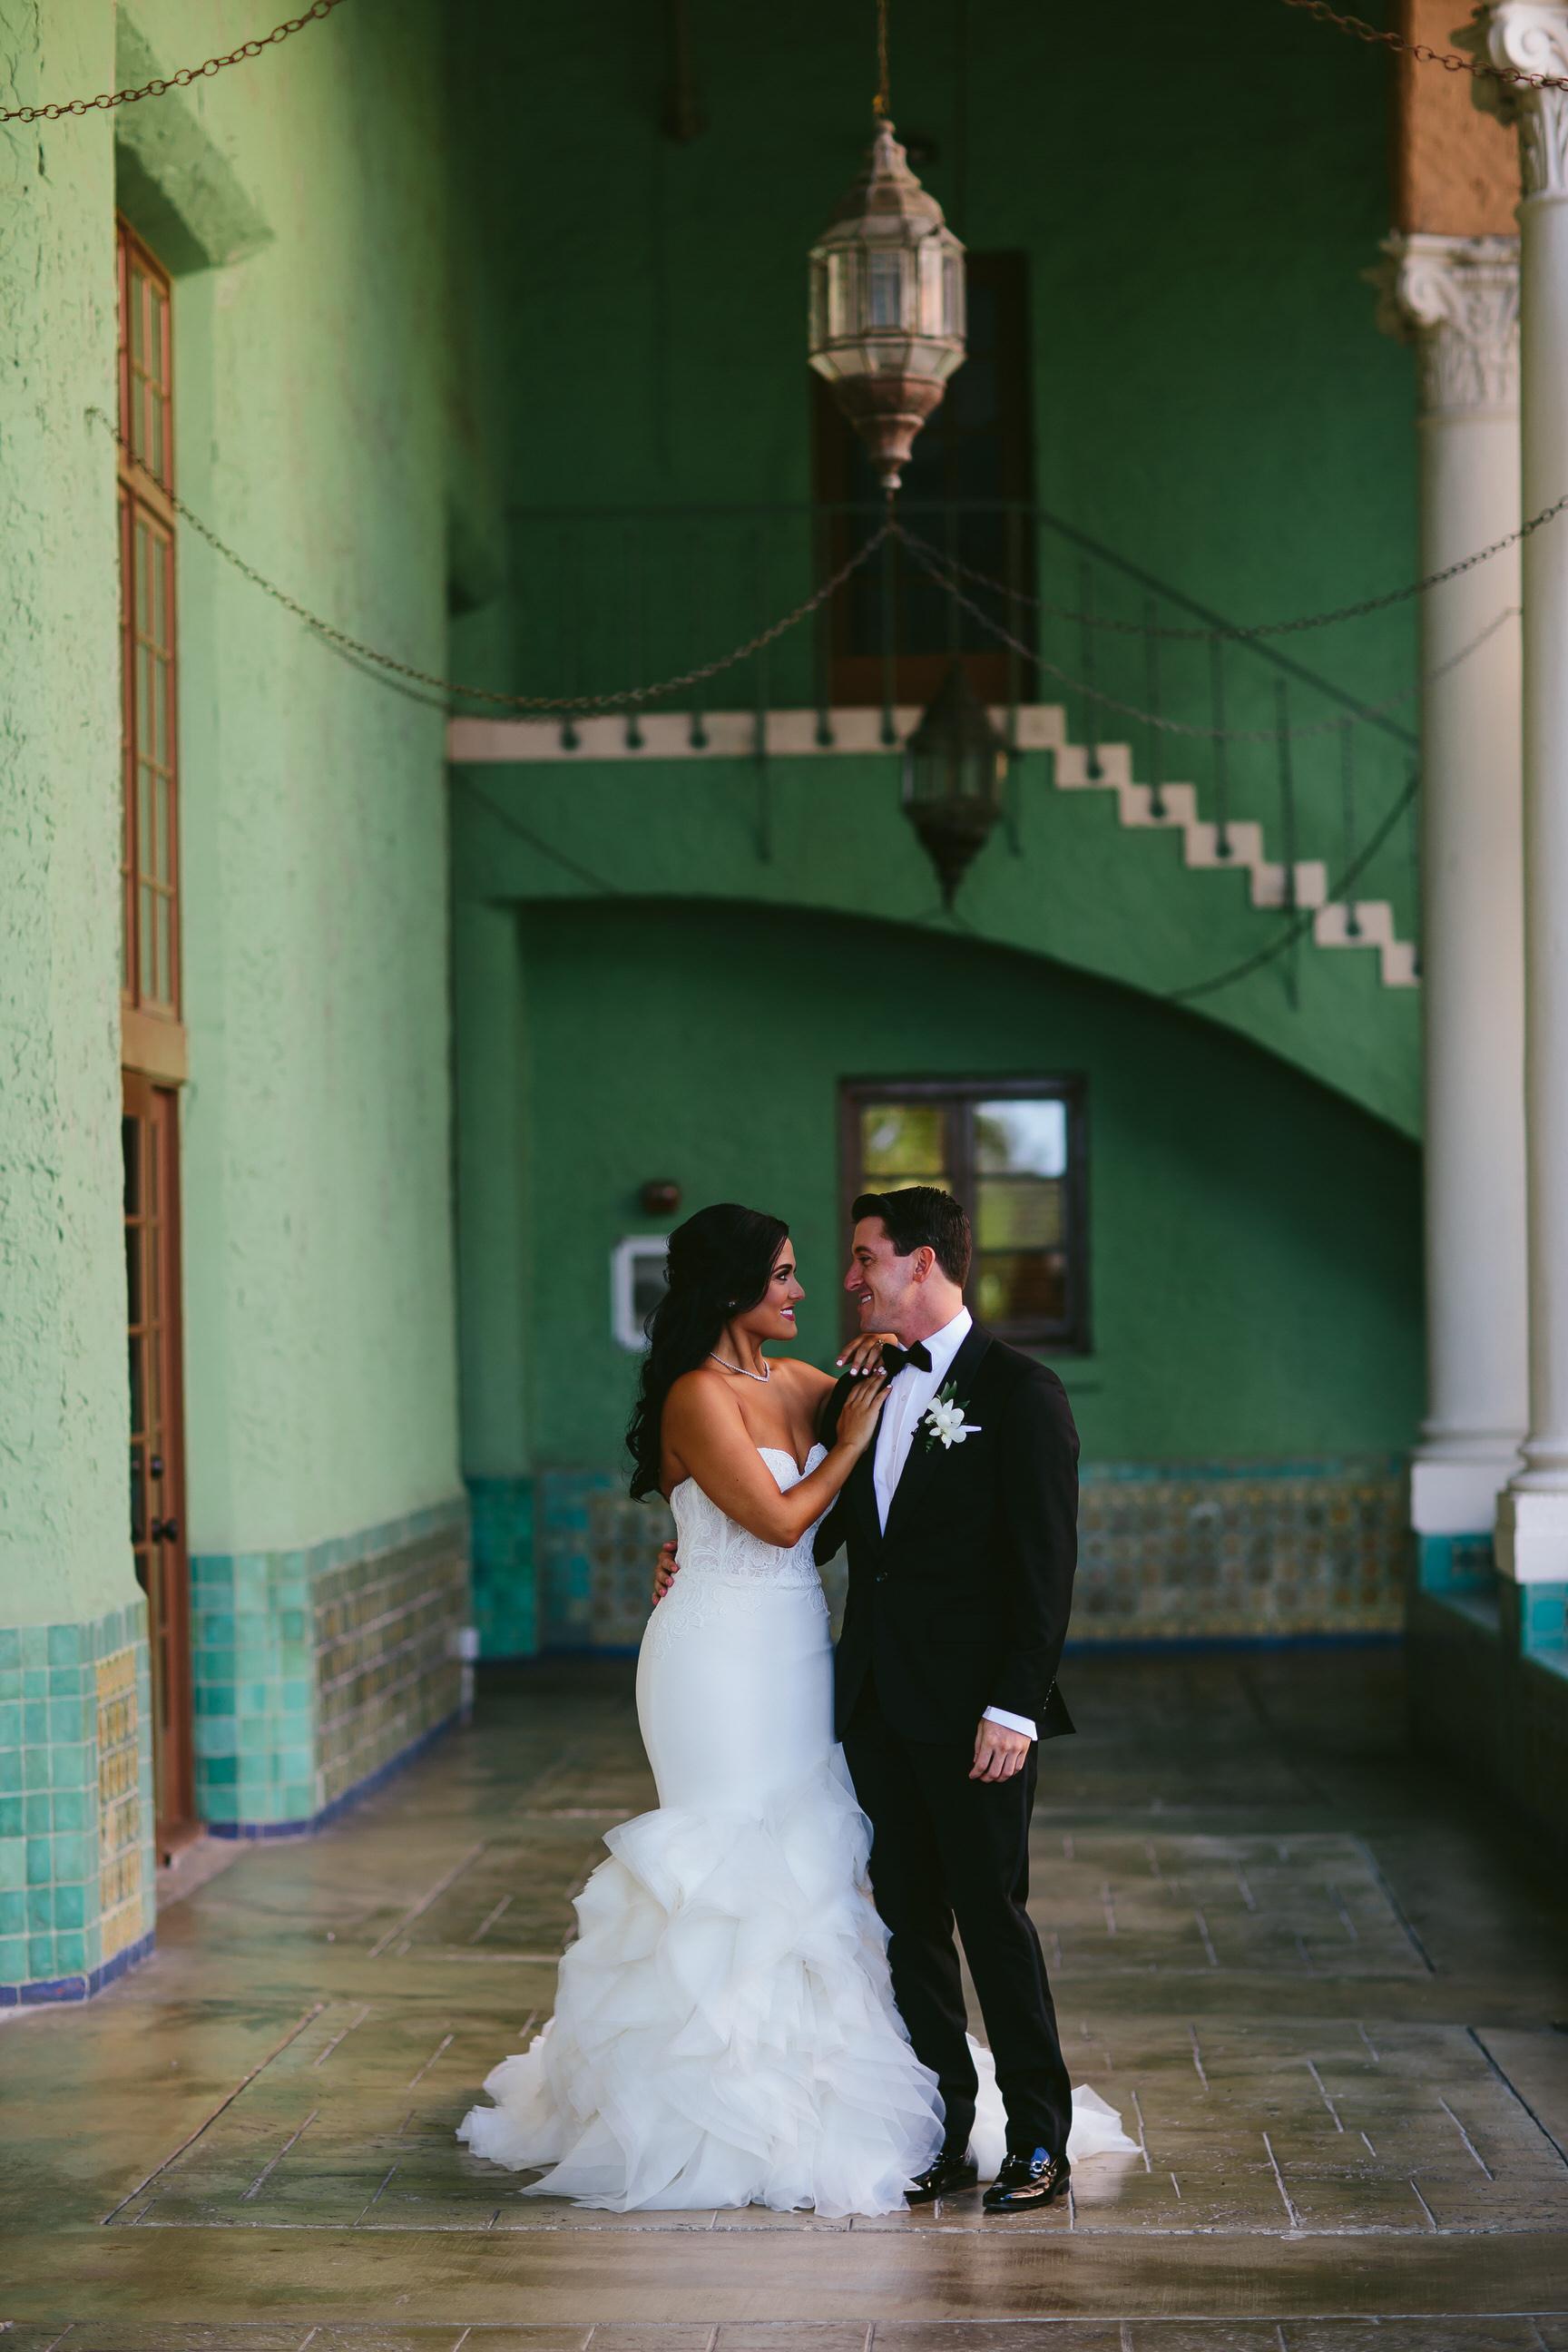 biltmore-wedding-steph-lynn-photo-photographer-bride-and-groom-8.jpg